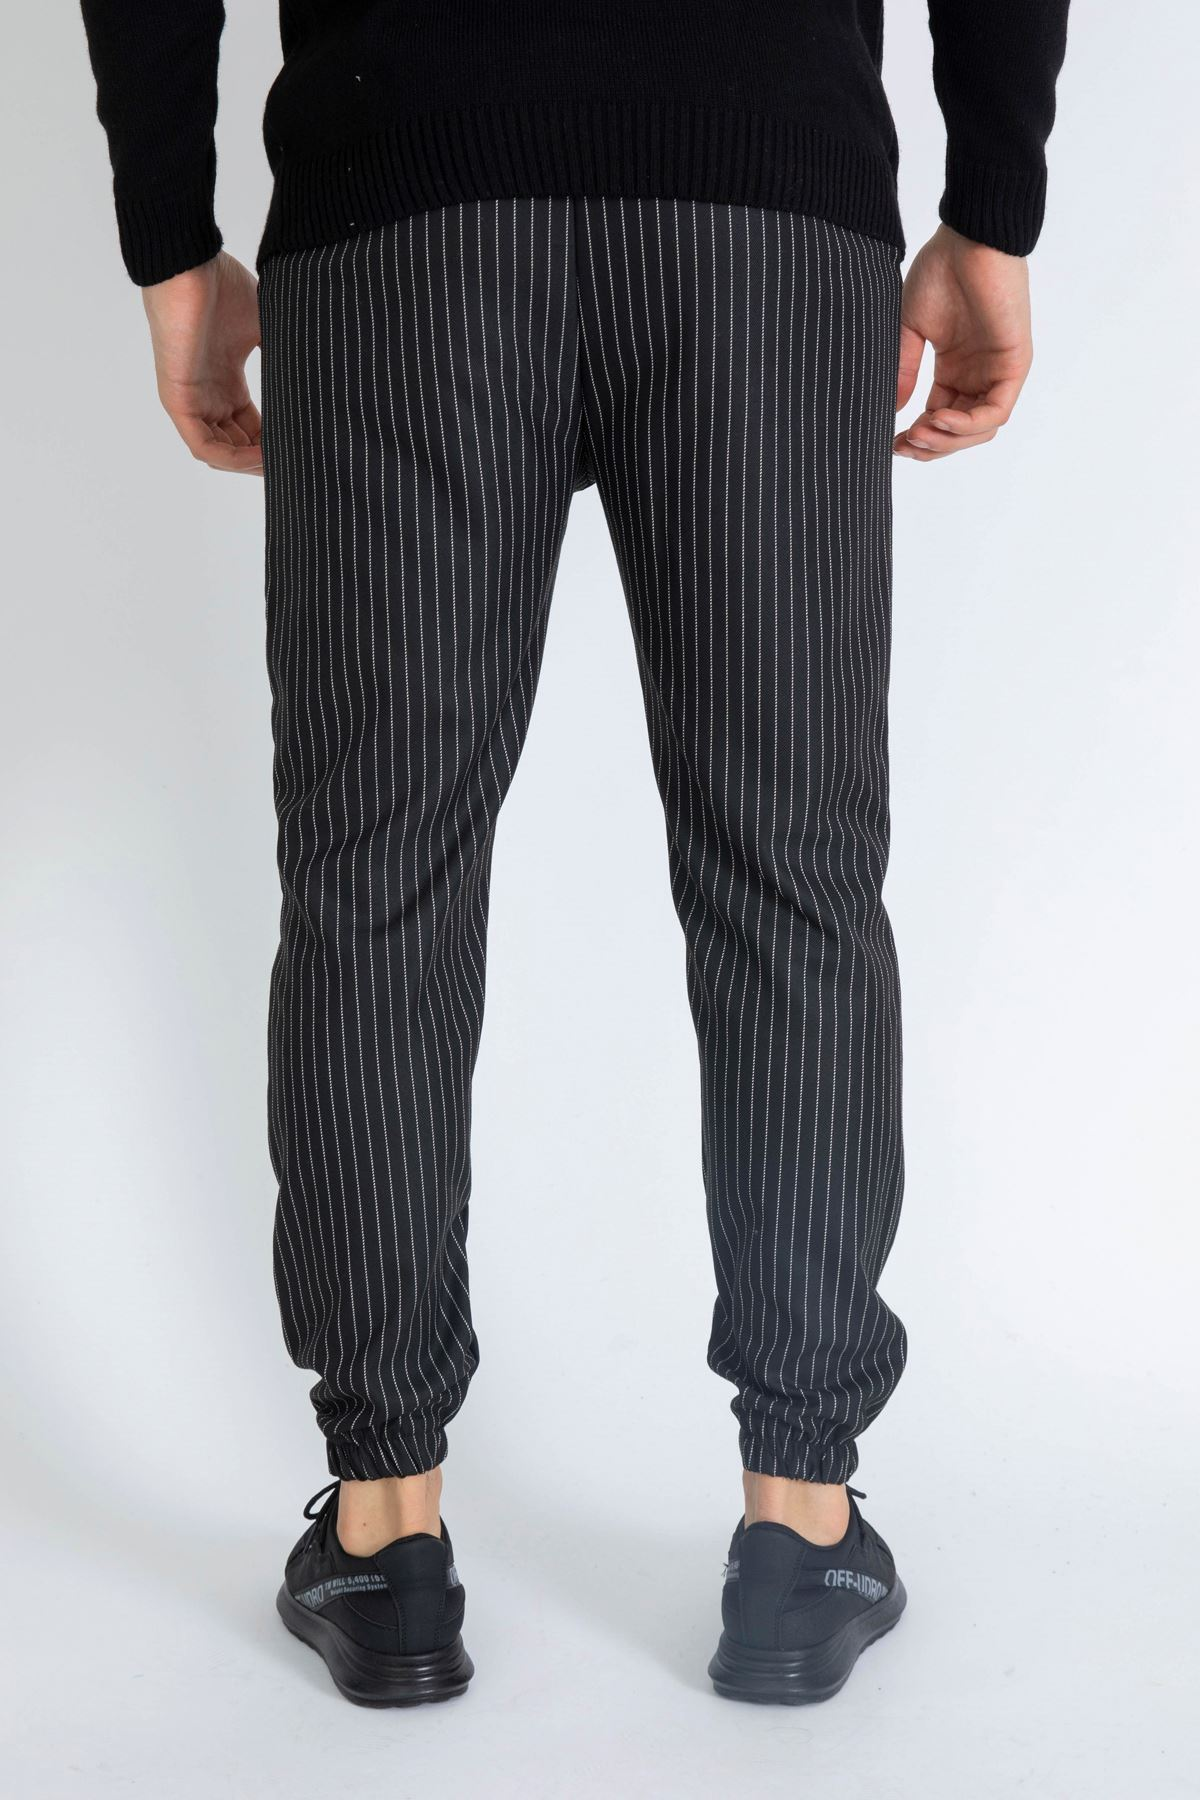 Erkek Beli Lastikli Çizgili Siyah Jogger Pantolon